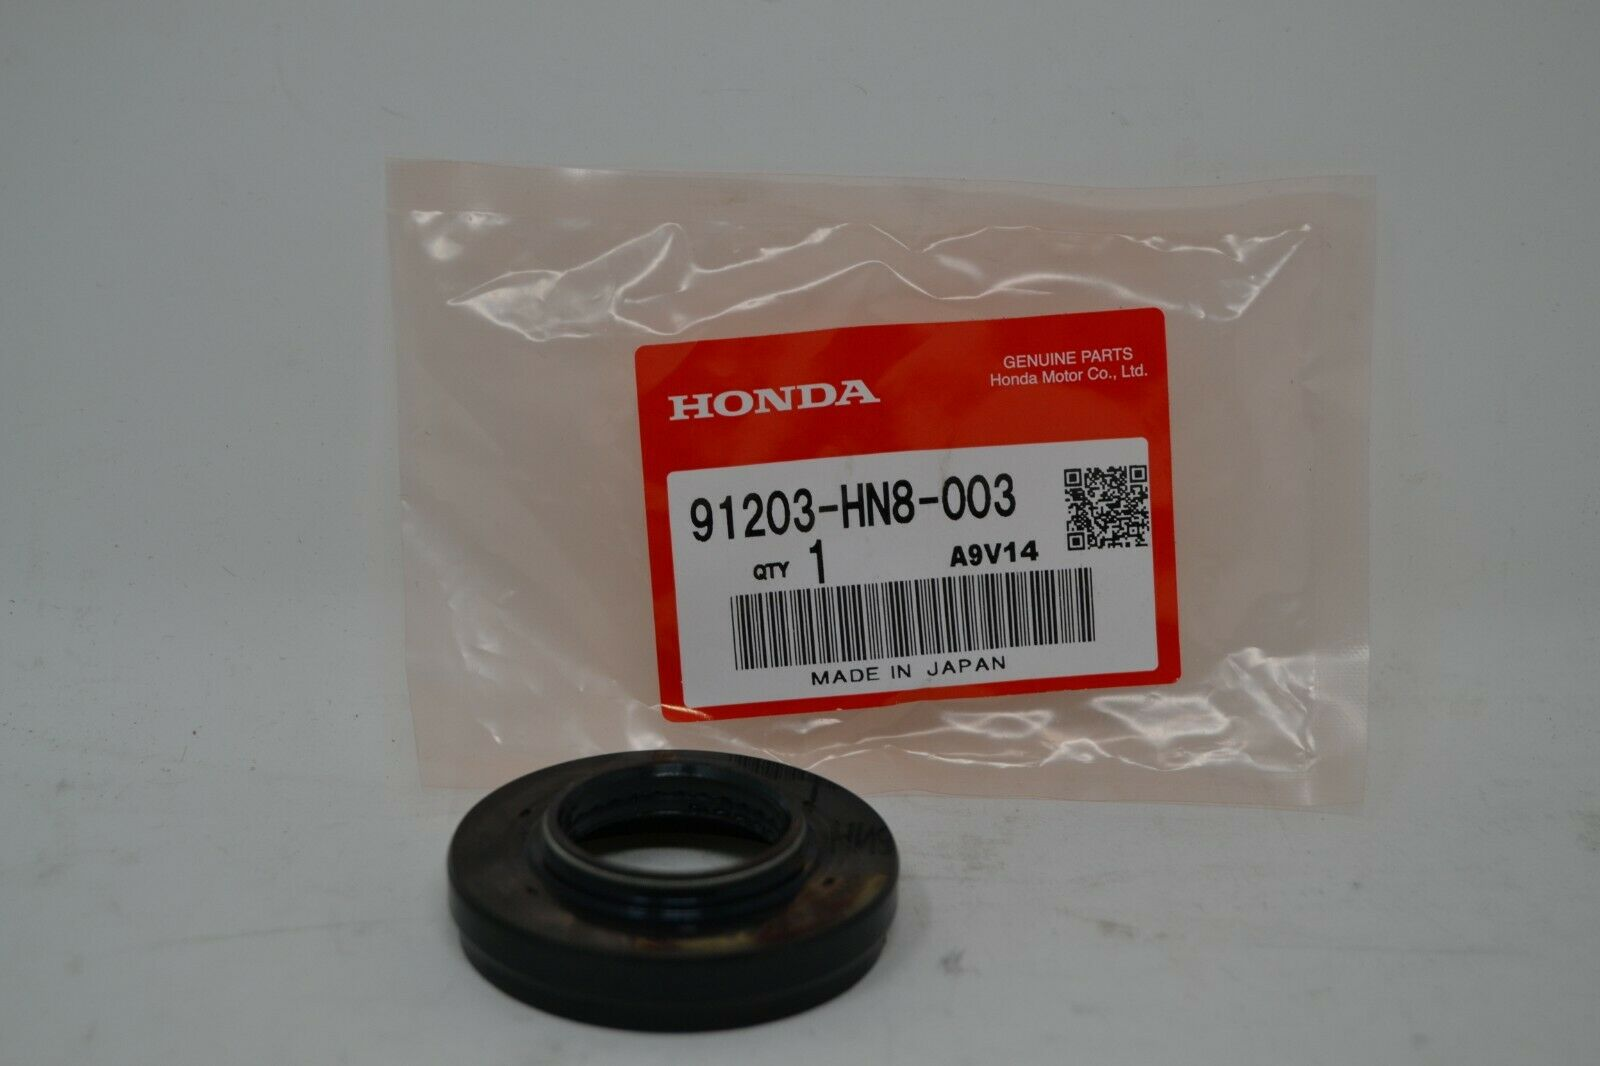 HONDA 91203-HN8-003 OIL SEAL 28X55X7